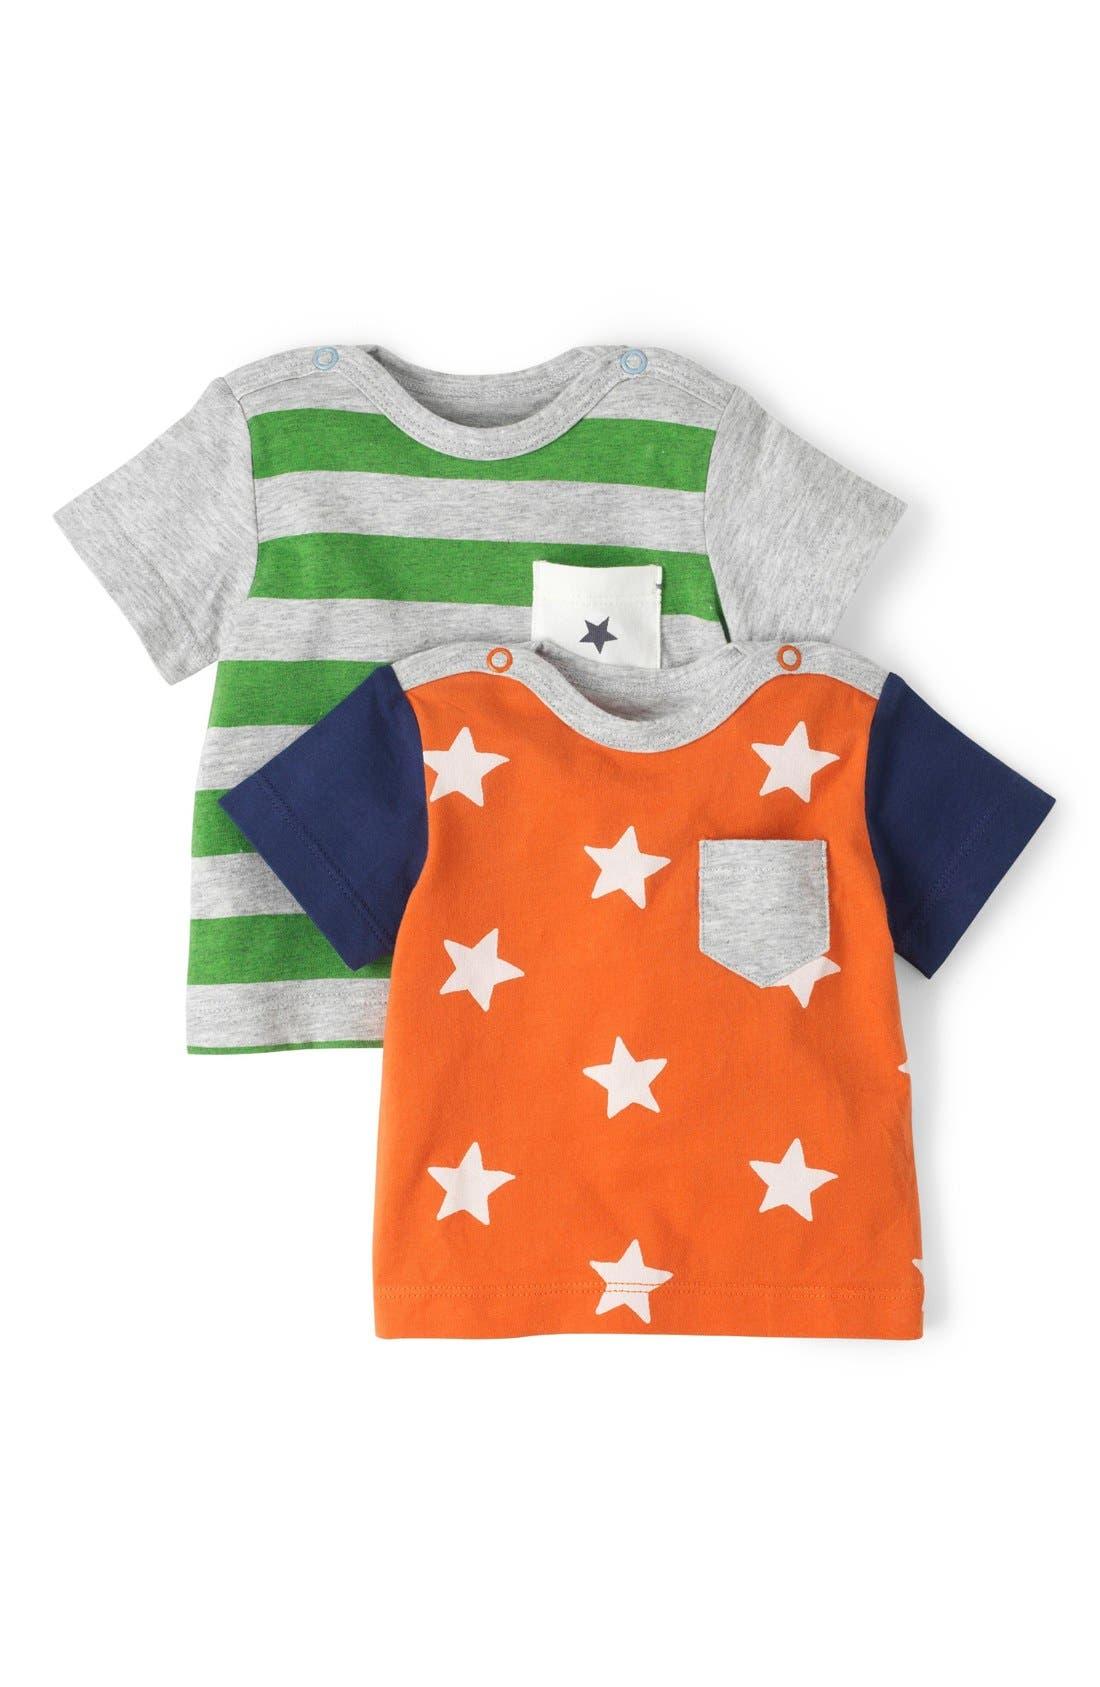 Main Image - Mini Boden 'Hotchpotch' Chest Pocket T-Shirts (Set of 2) (Baby Boys)